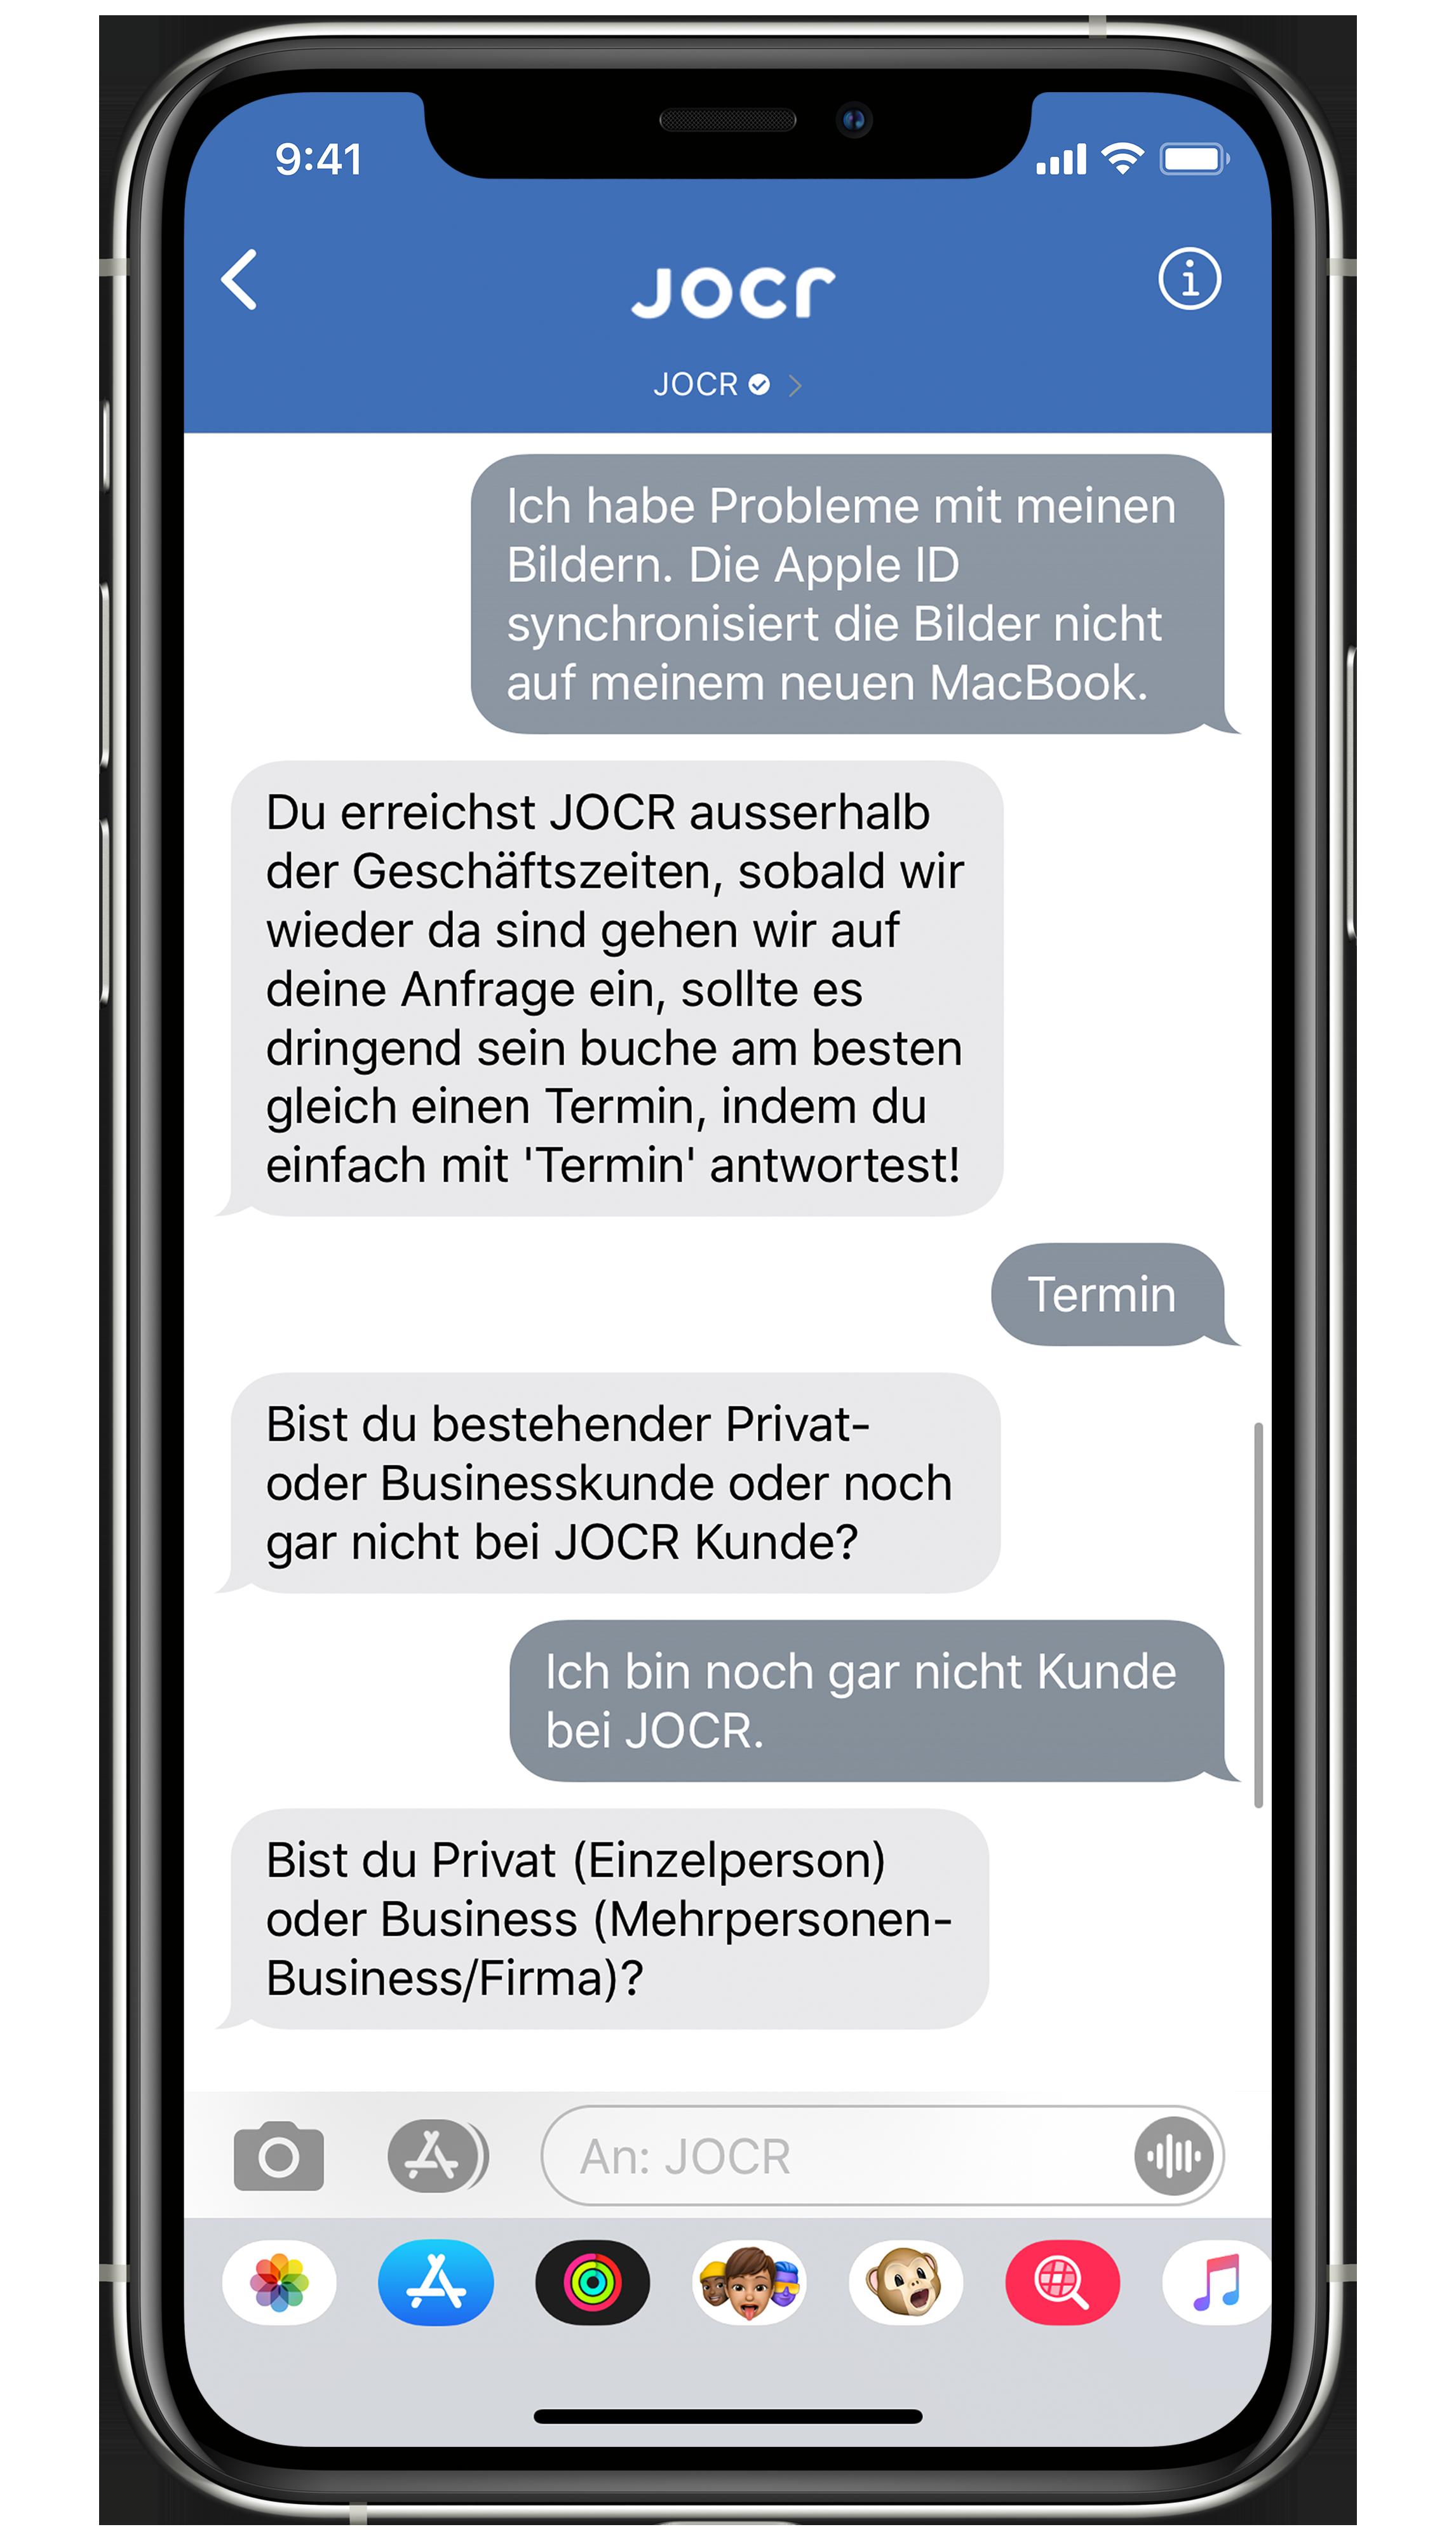 JOCR - Apple Business Chat